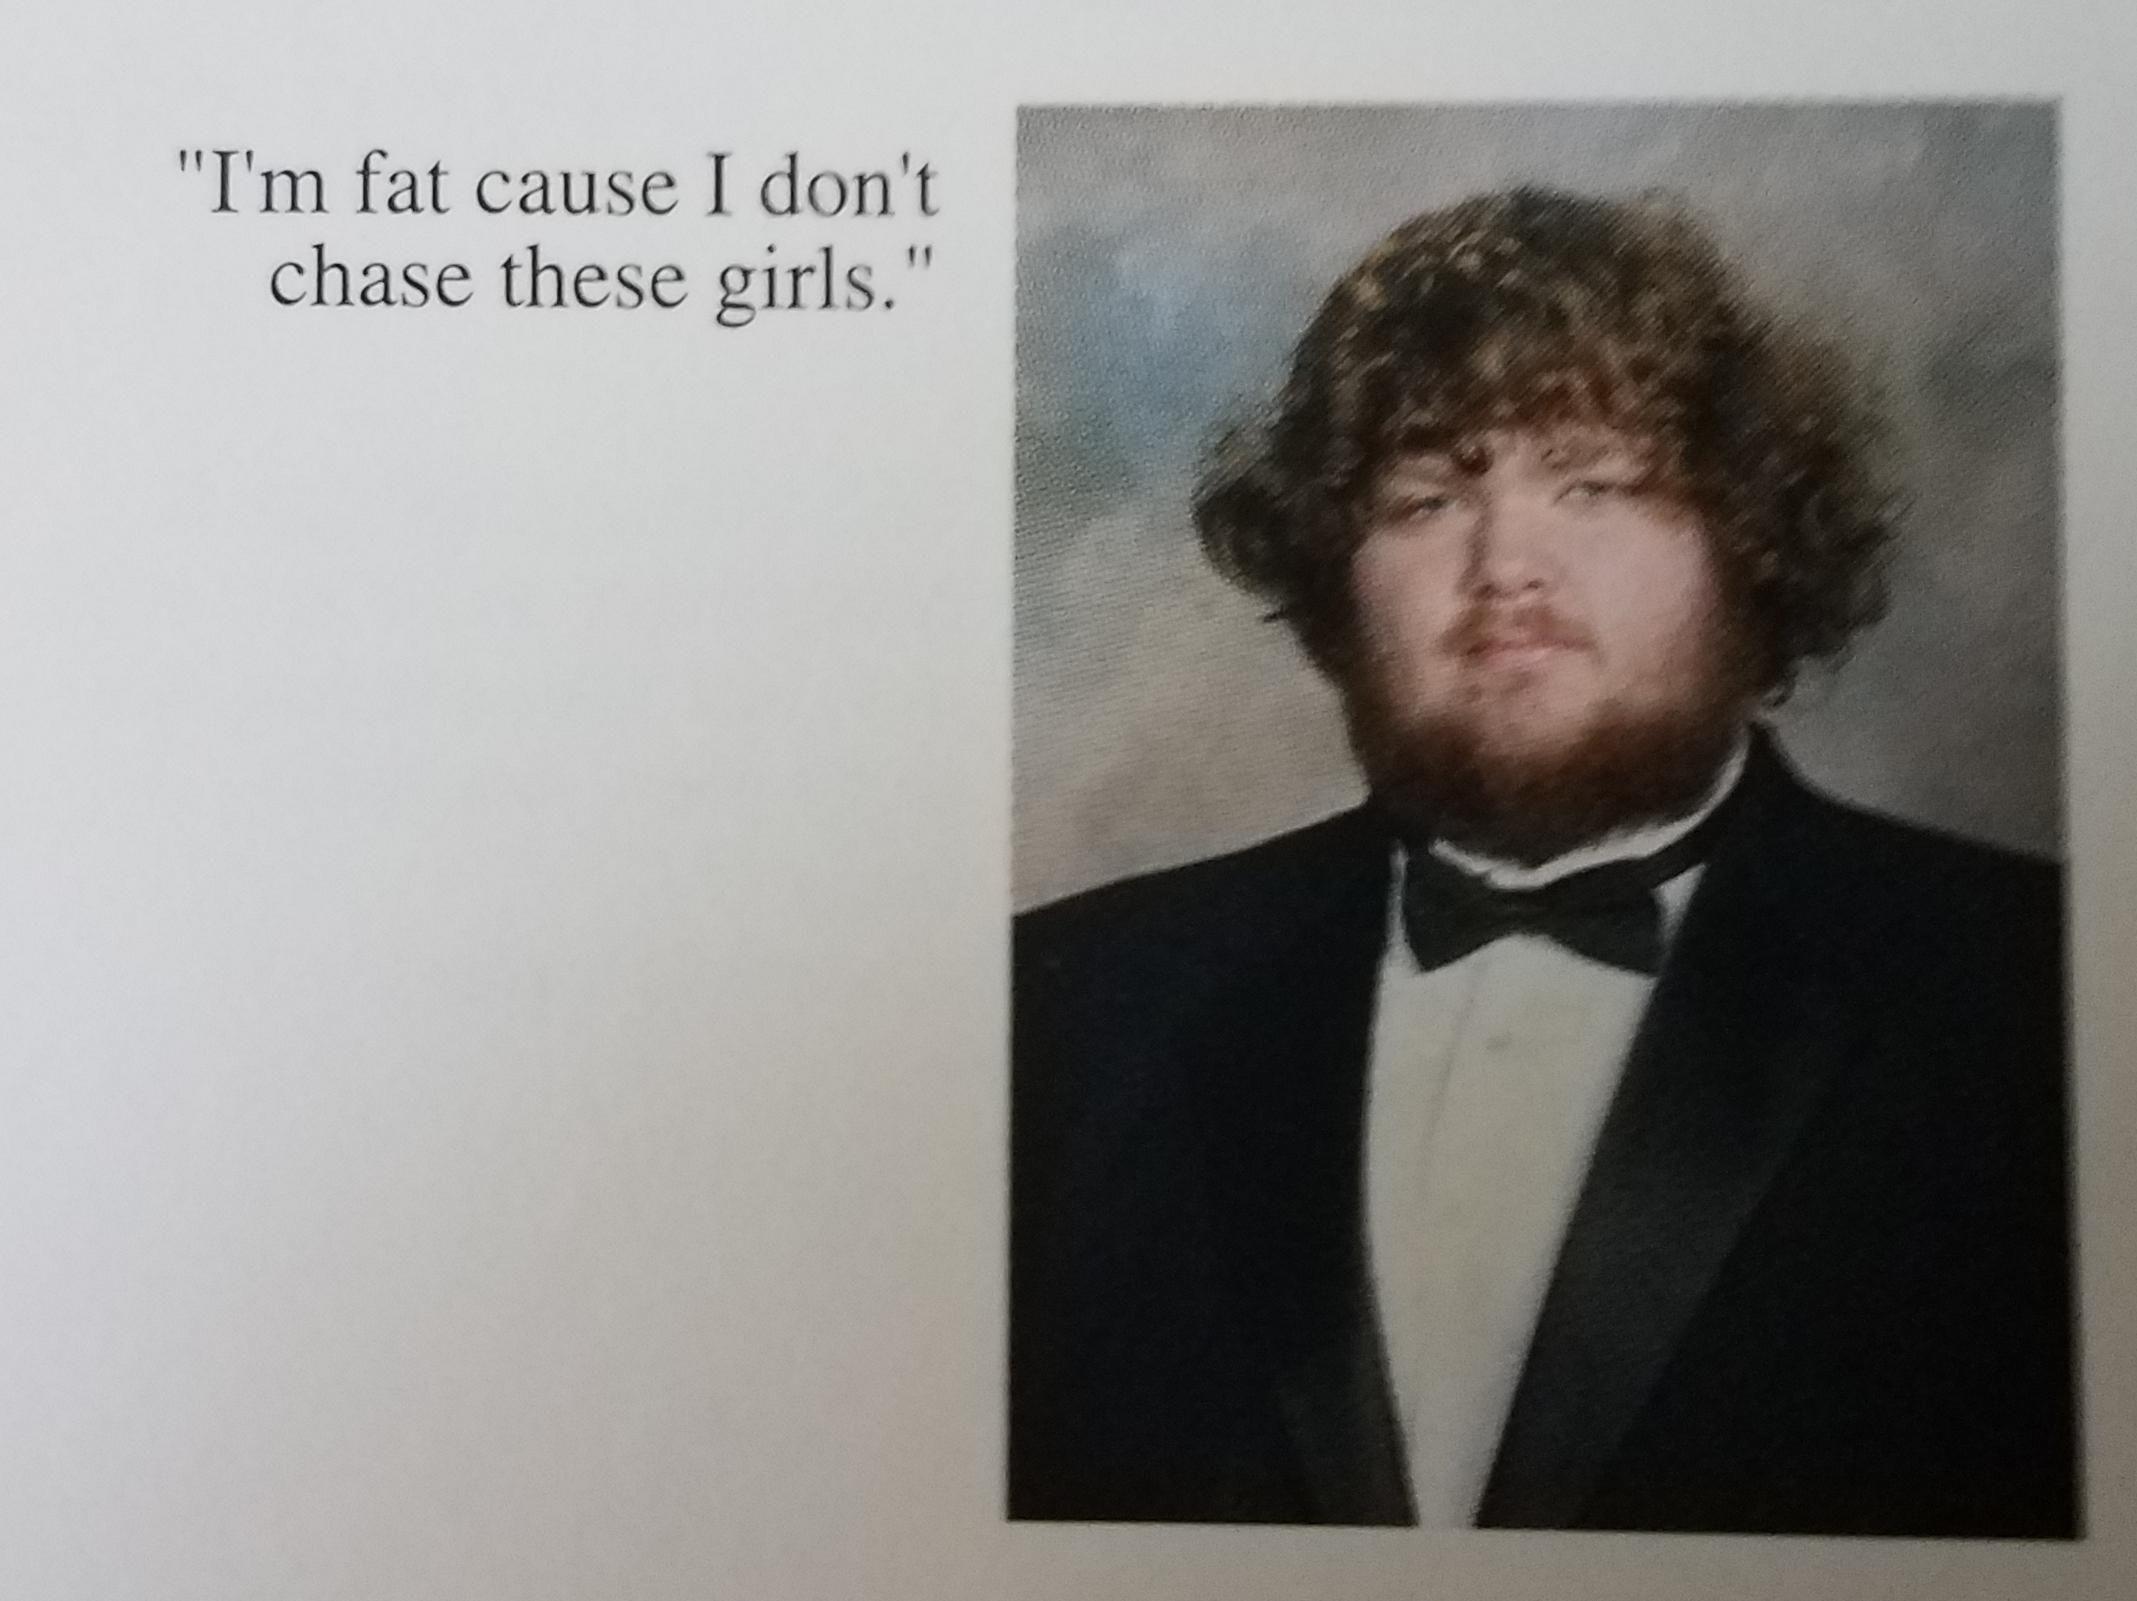 Reddit Funny Yearbook Quotes Https Ift Tt 2mj9aqp Funny Yearbook Quotes Yearbook Quotes Funny Yearbook